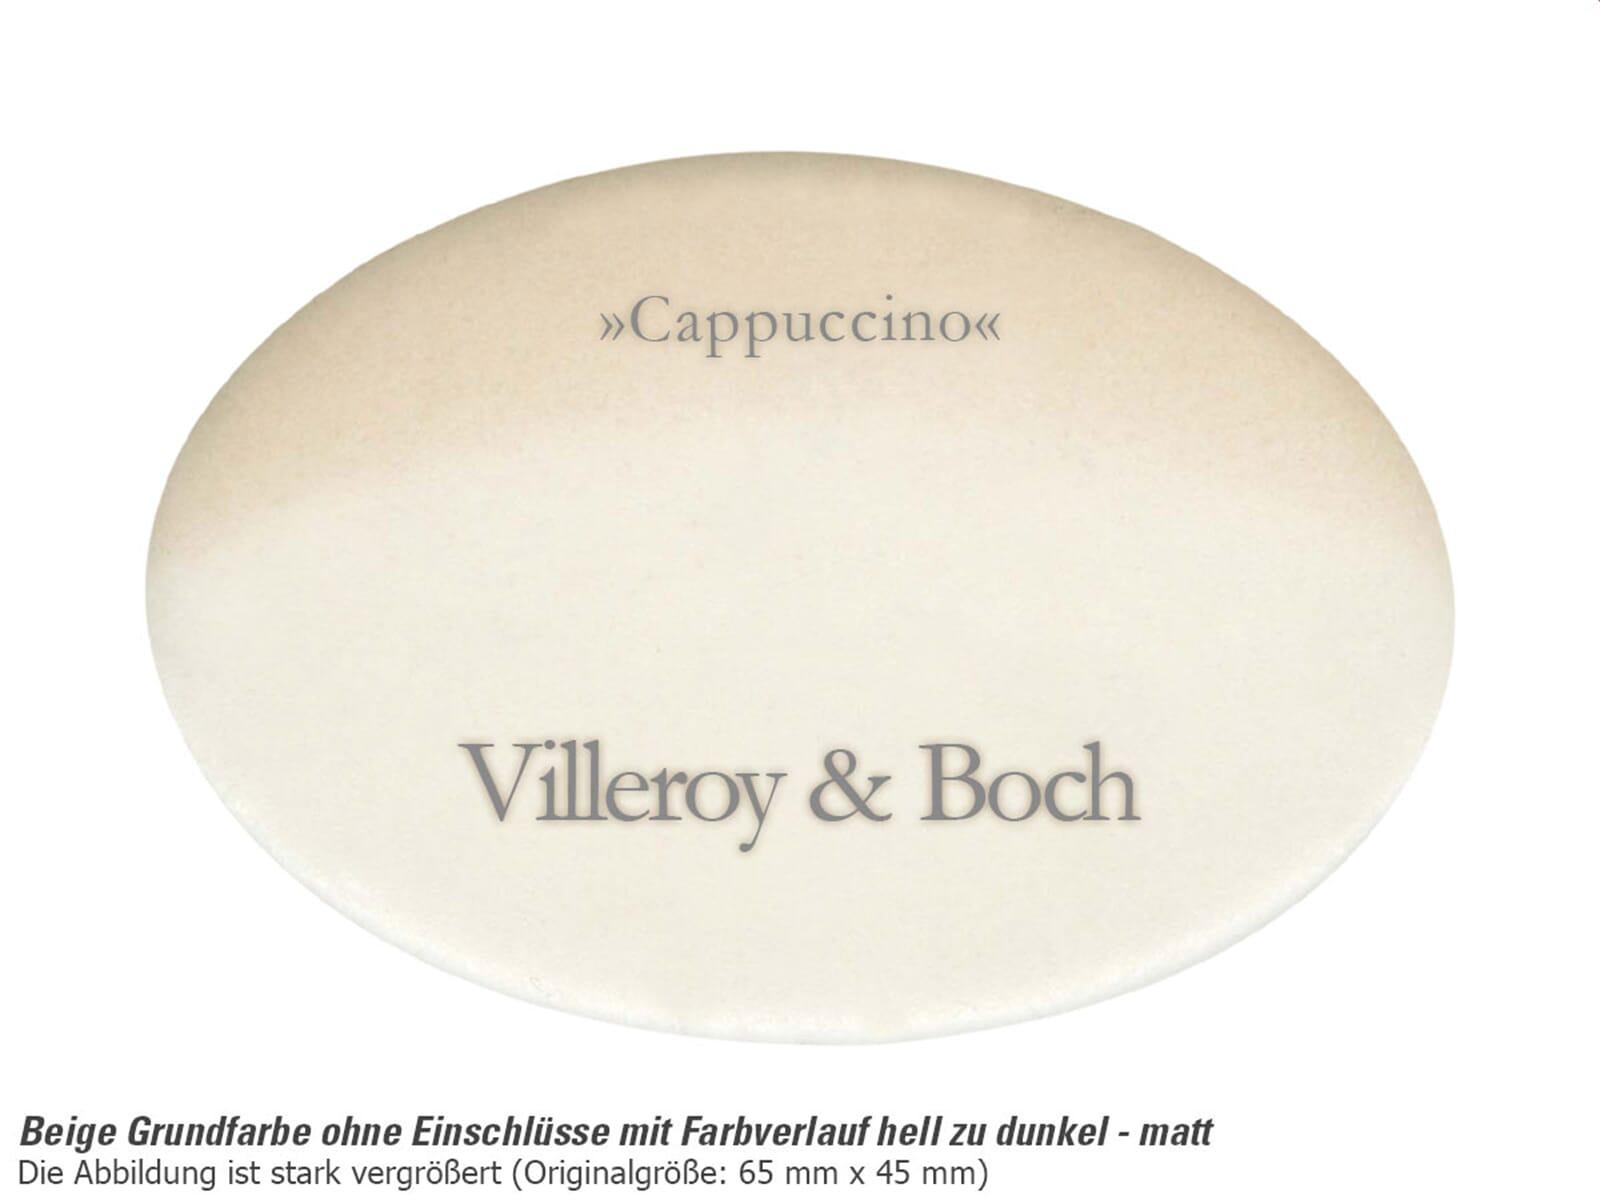 Villeroy & Boch Timeline 45 Cappuccino - 6791 02 i2 Keramikspüle Exzenterbetätigung